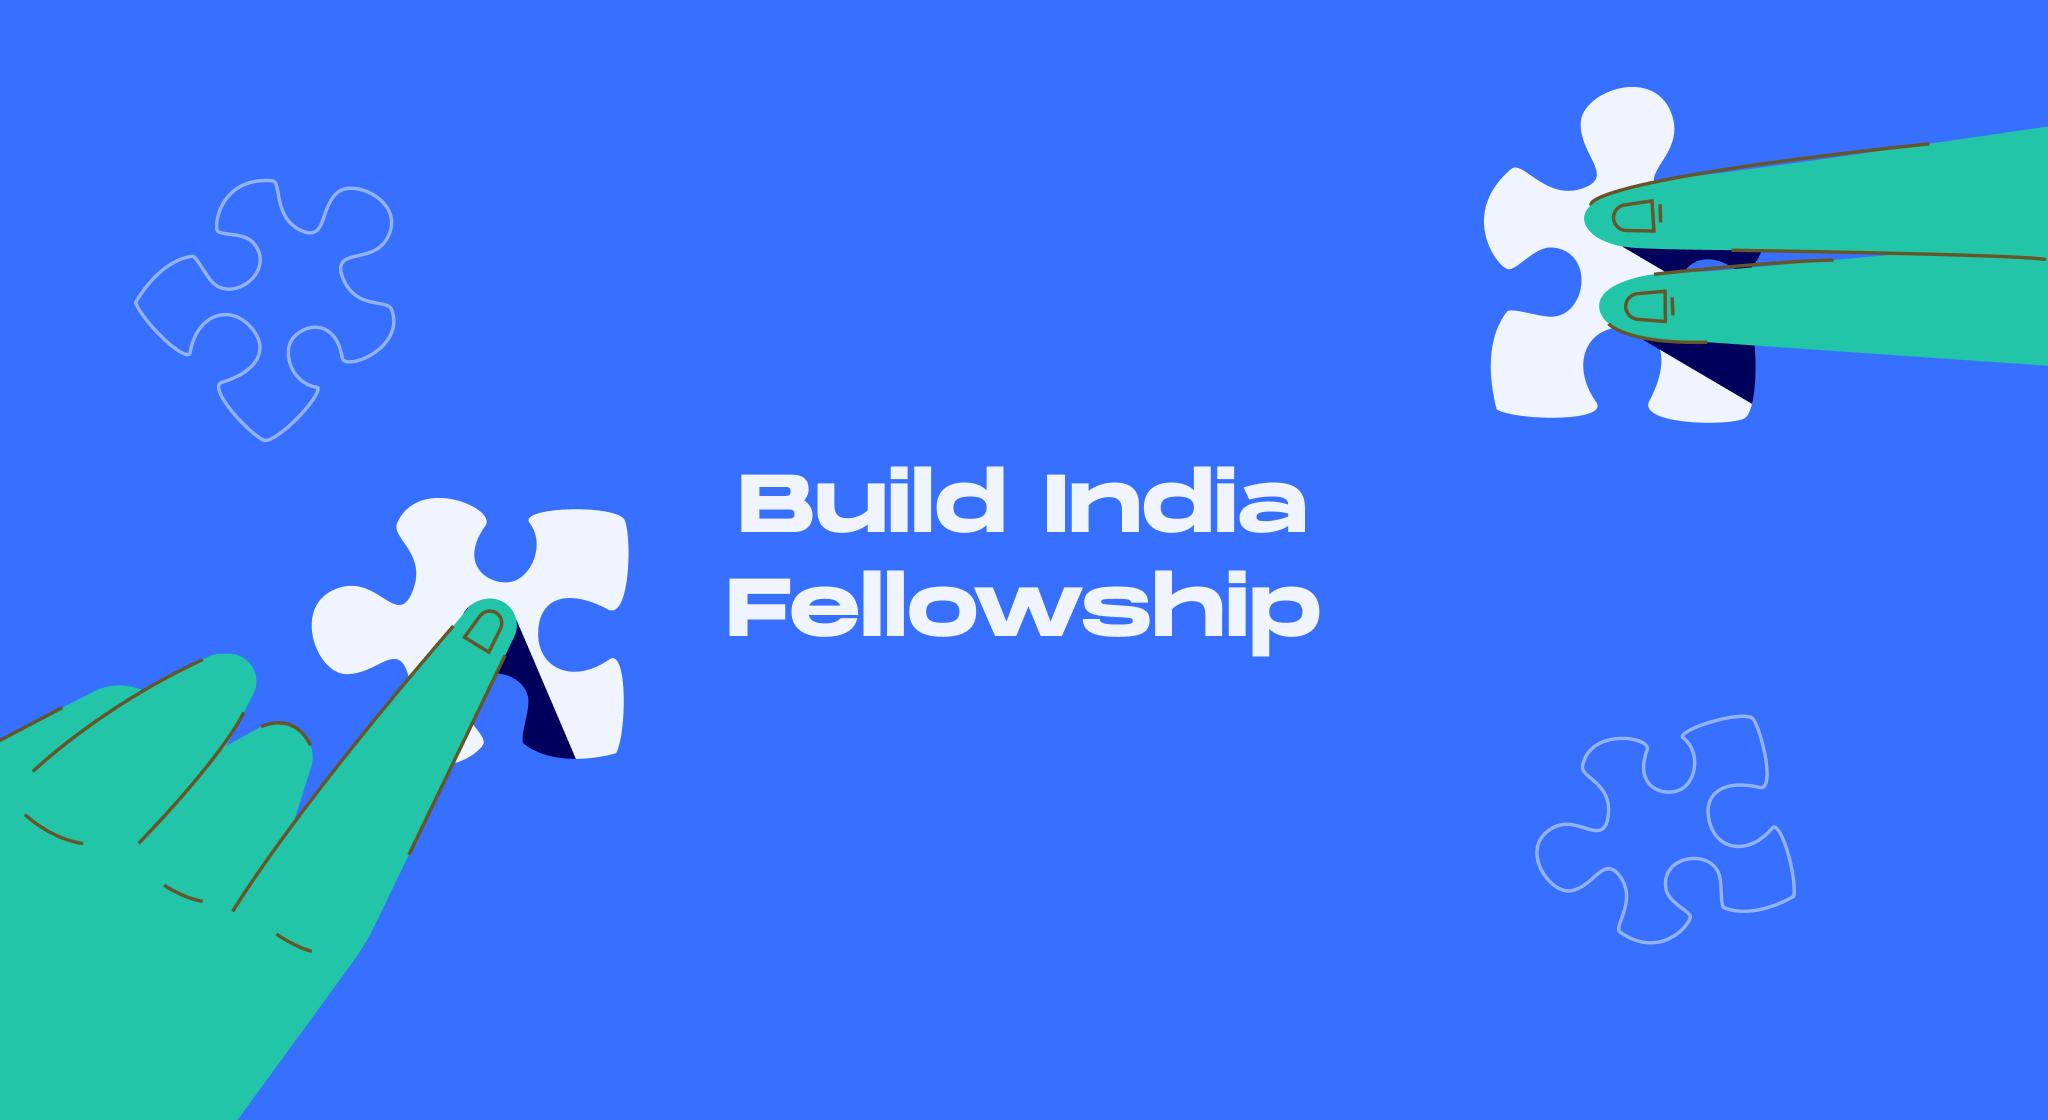 Build India Fellowship